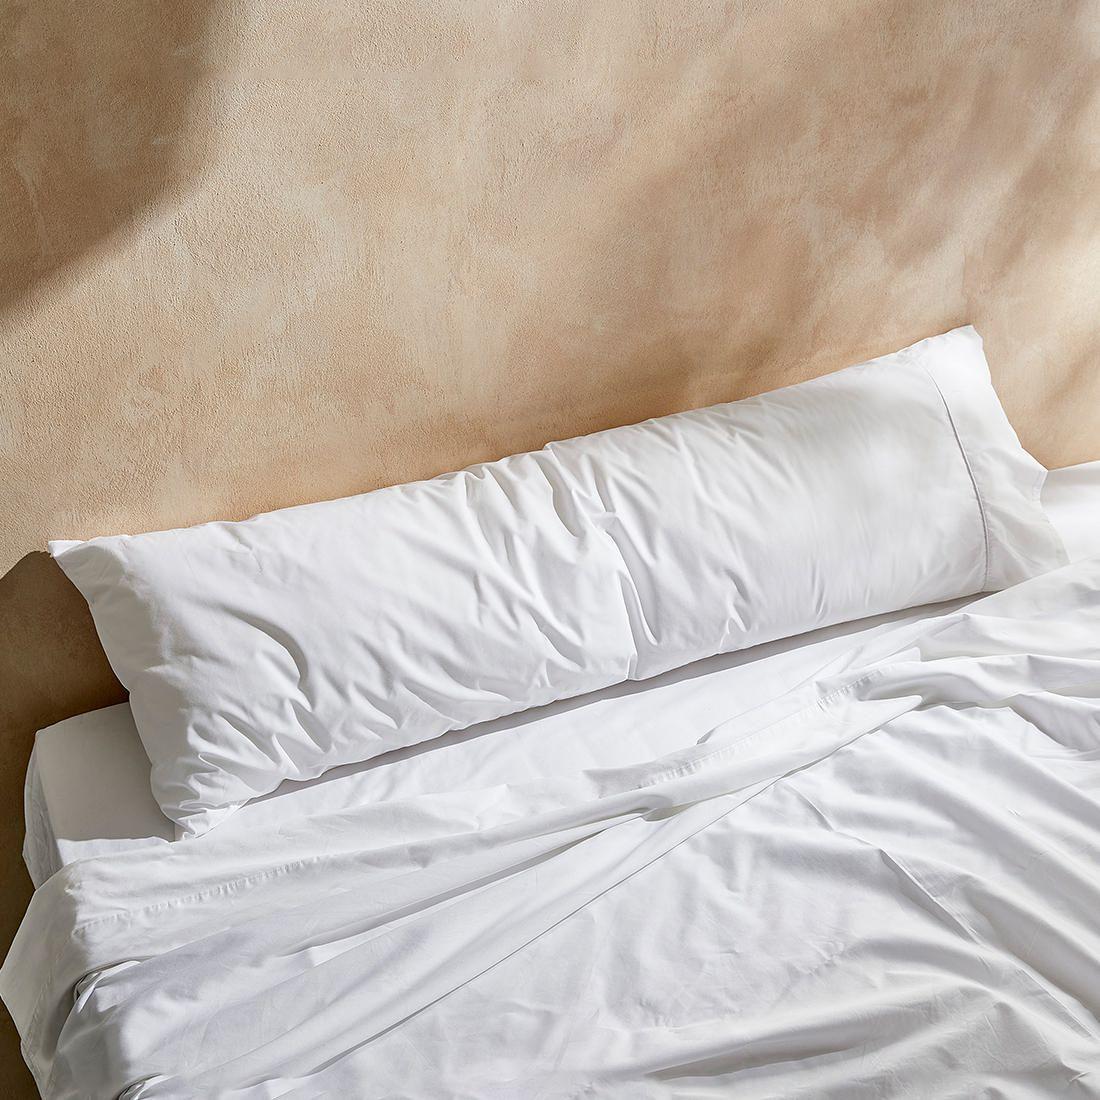 body pillow with pillowcase